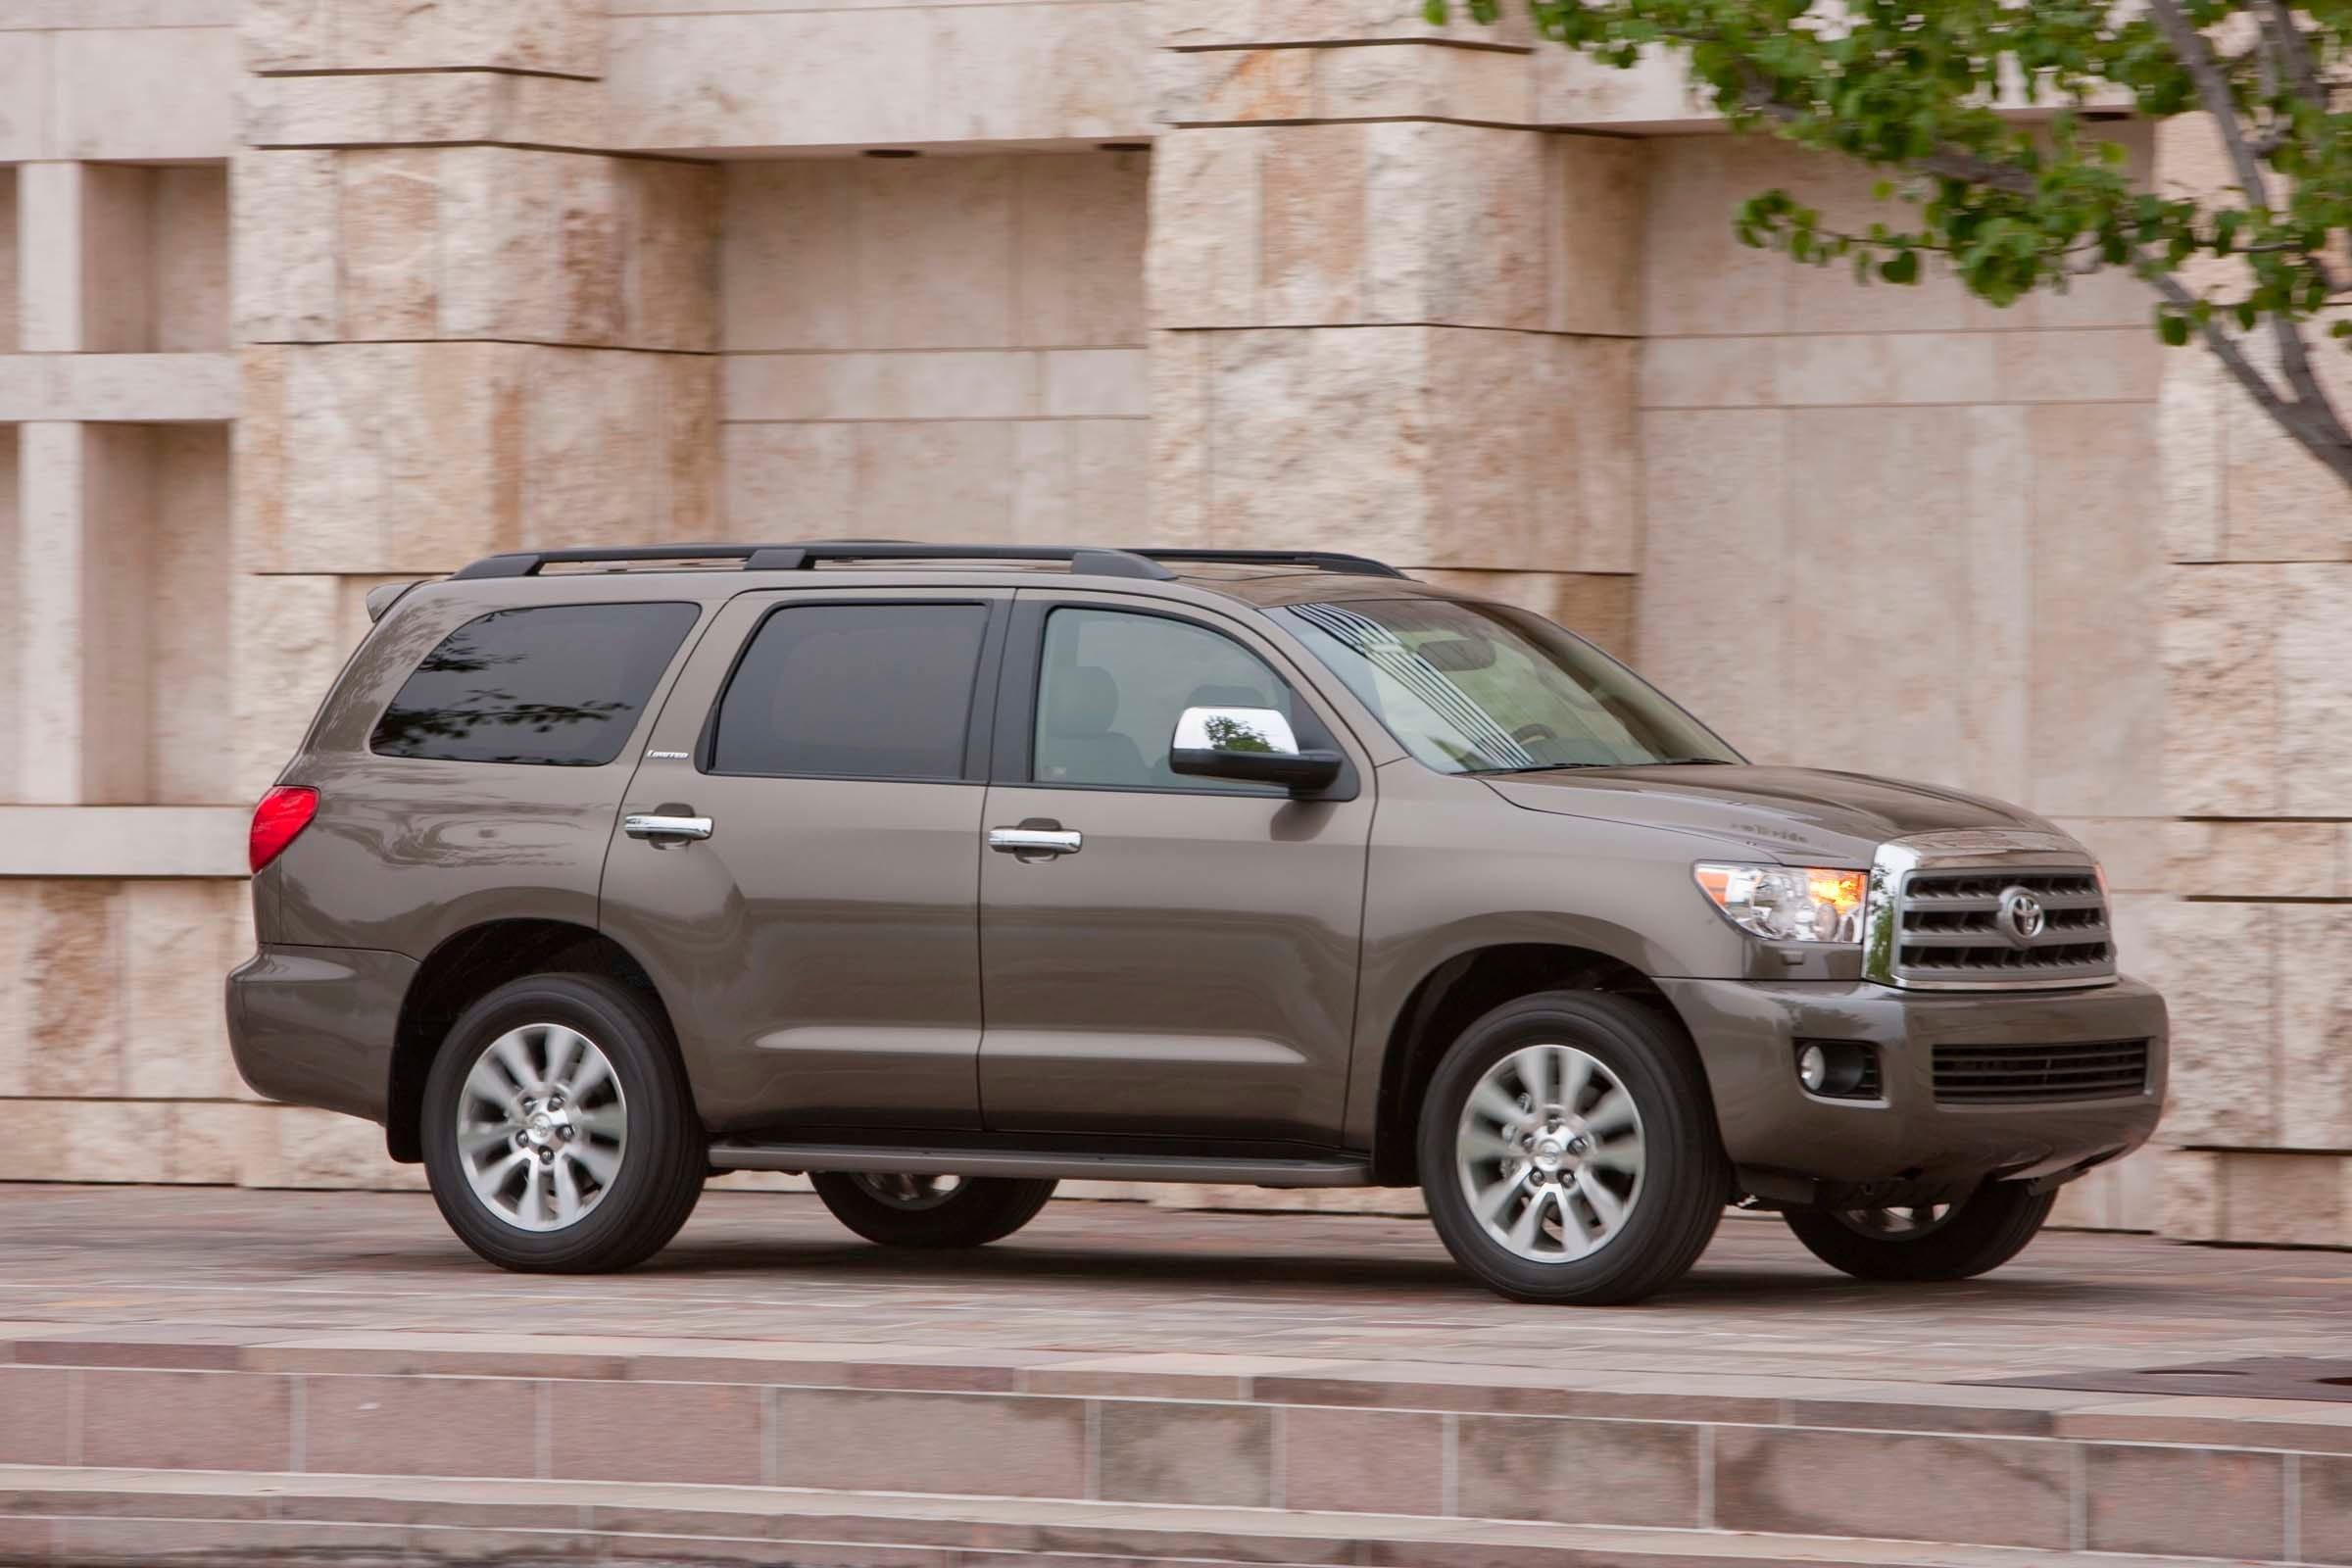 25. Toyota SequoiaÊfour Door 4WD Annual Average Insurance